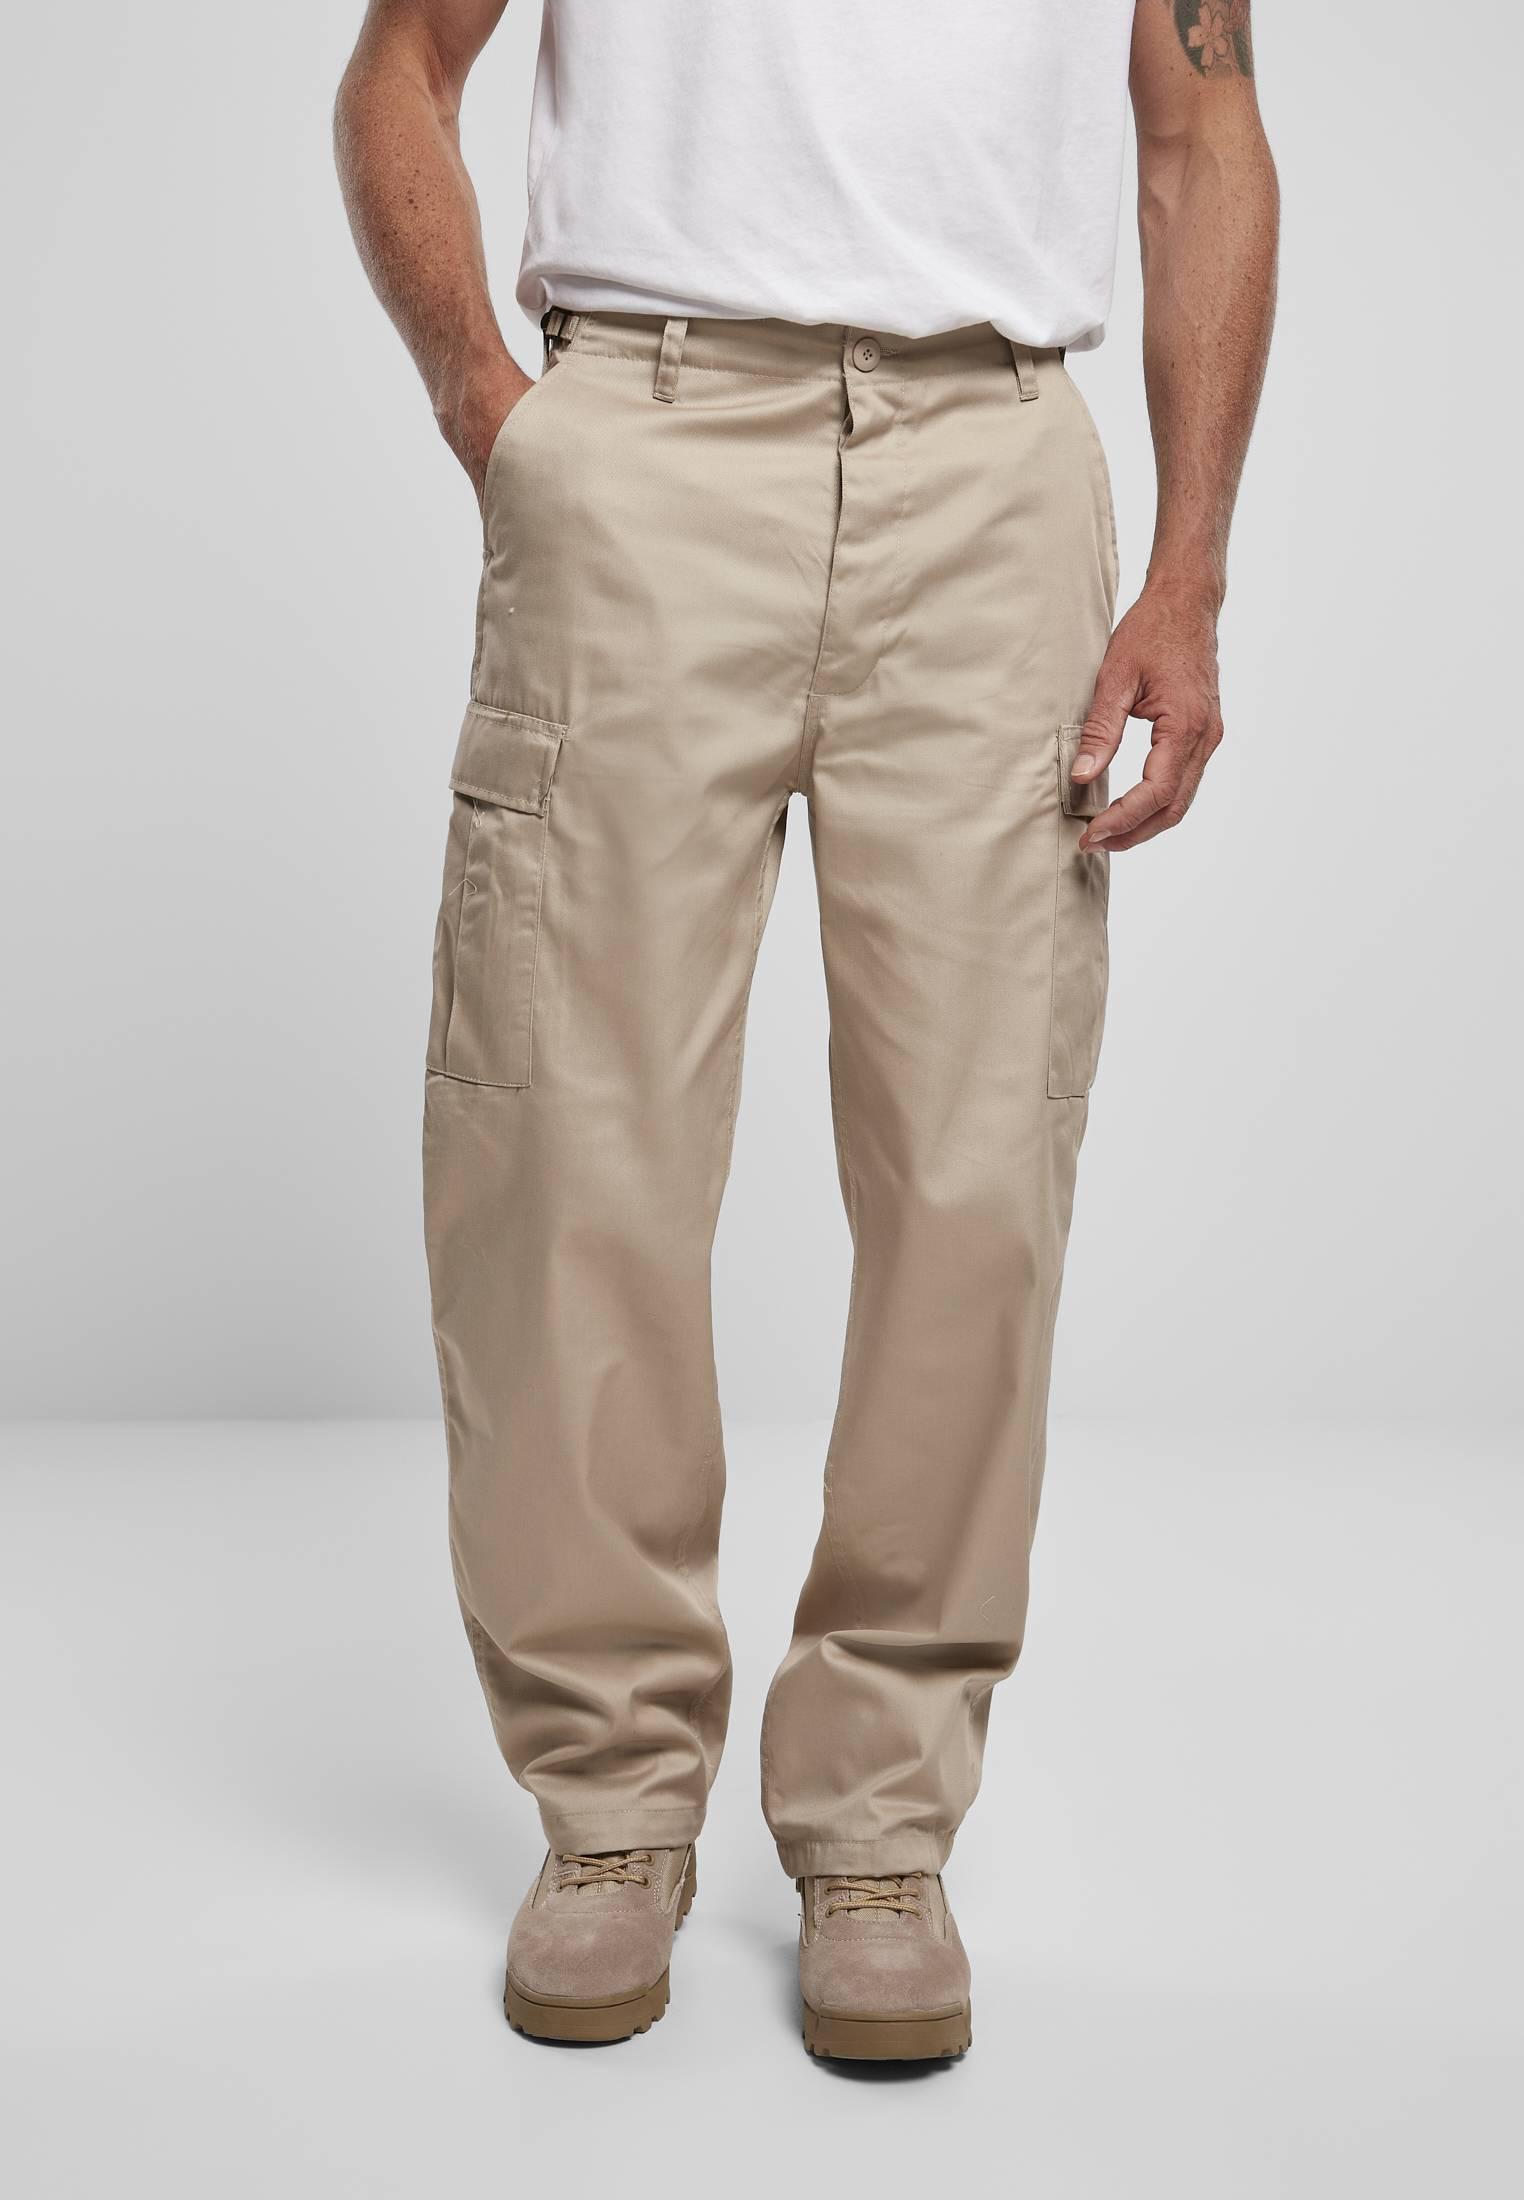 Urban Classics US Ranger Cargo Pants beige - XXL